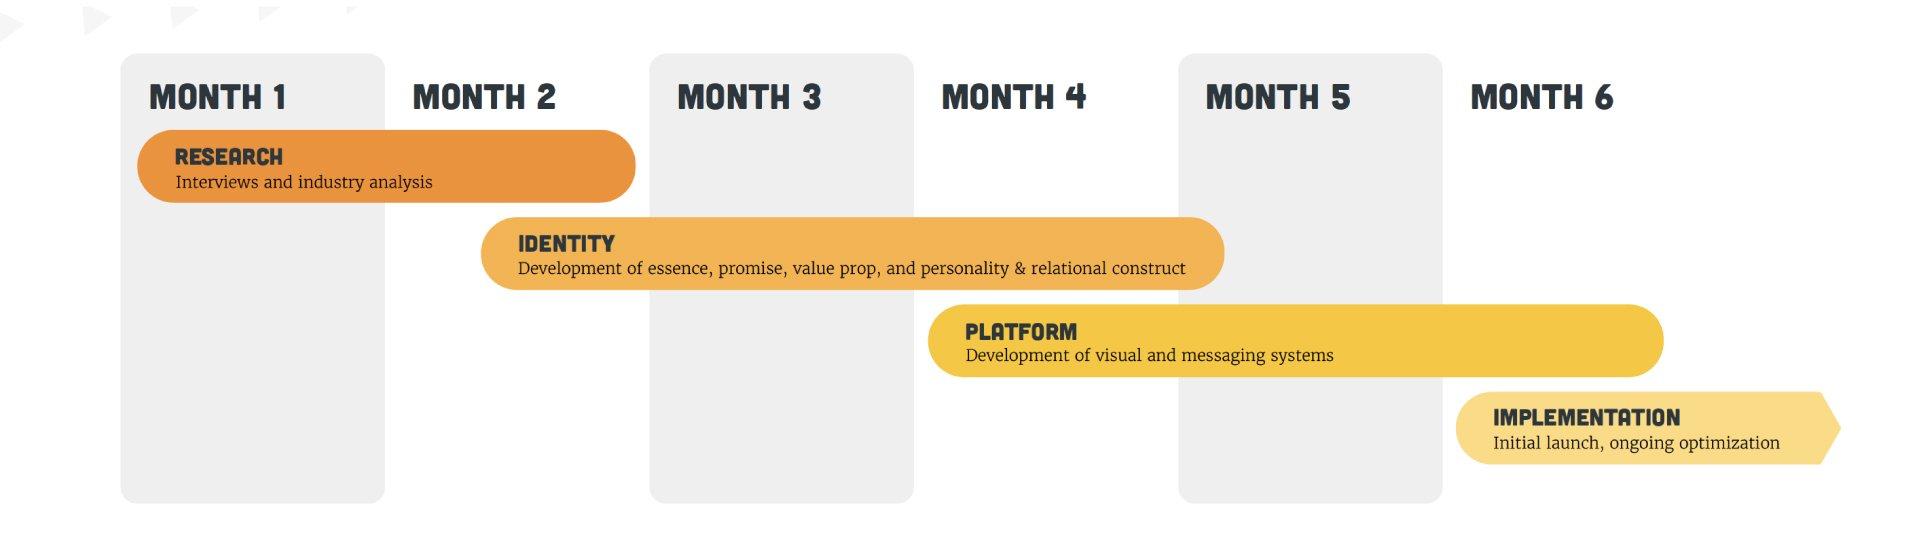 branding-timeline